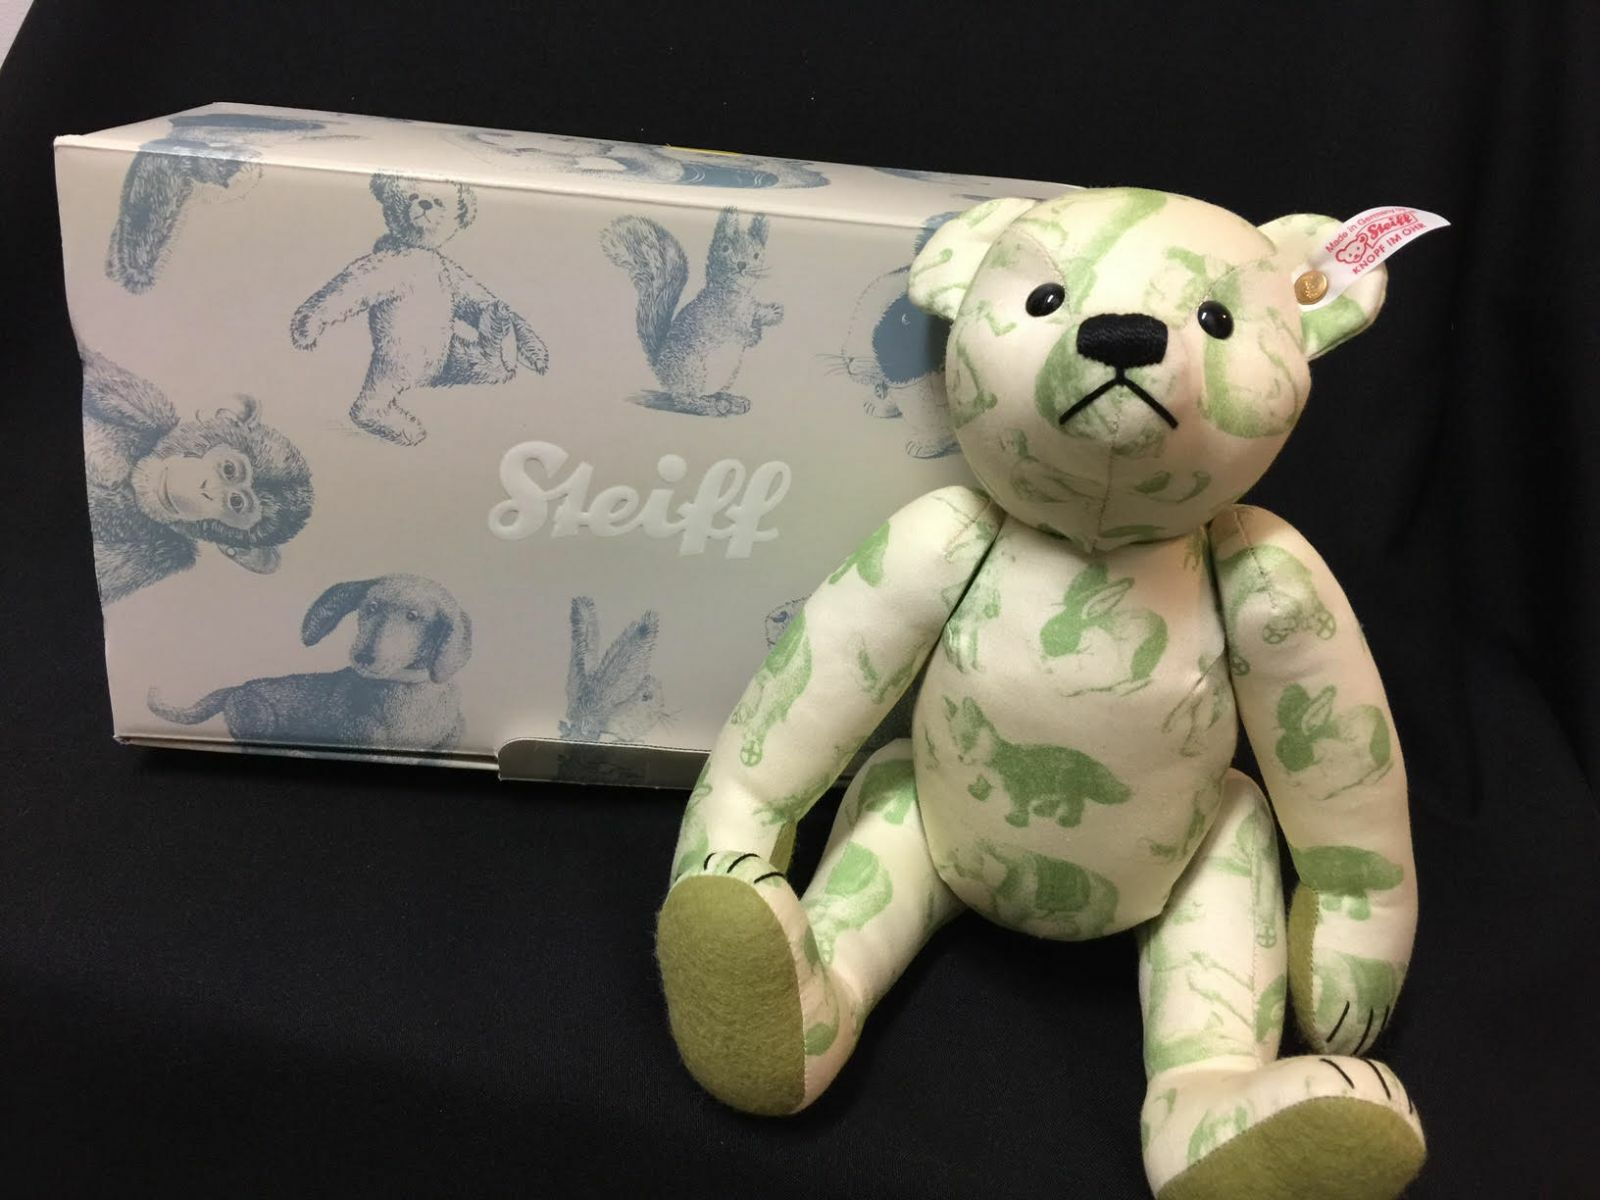 NIB Steiff Classic Collectible verde Signature Posable 12  Teddy Bear 037245 FS